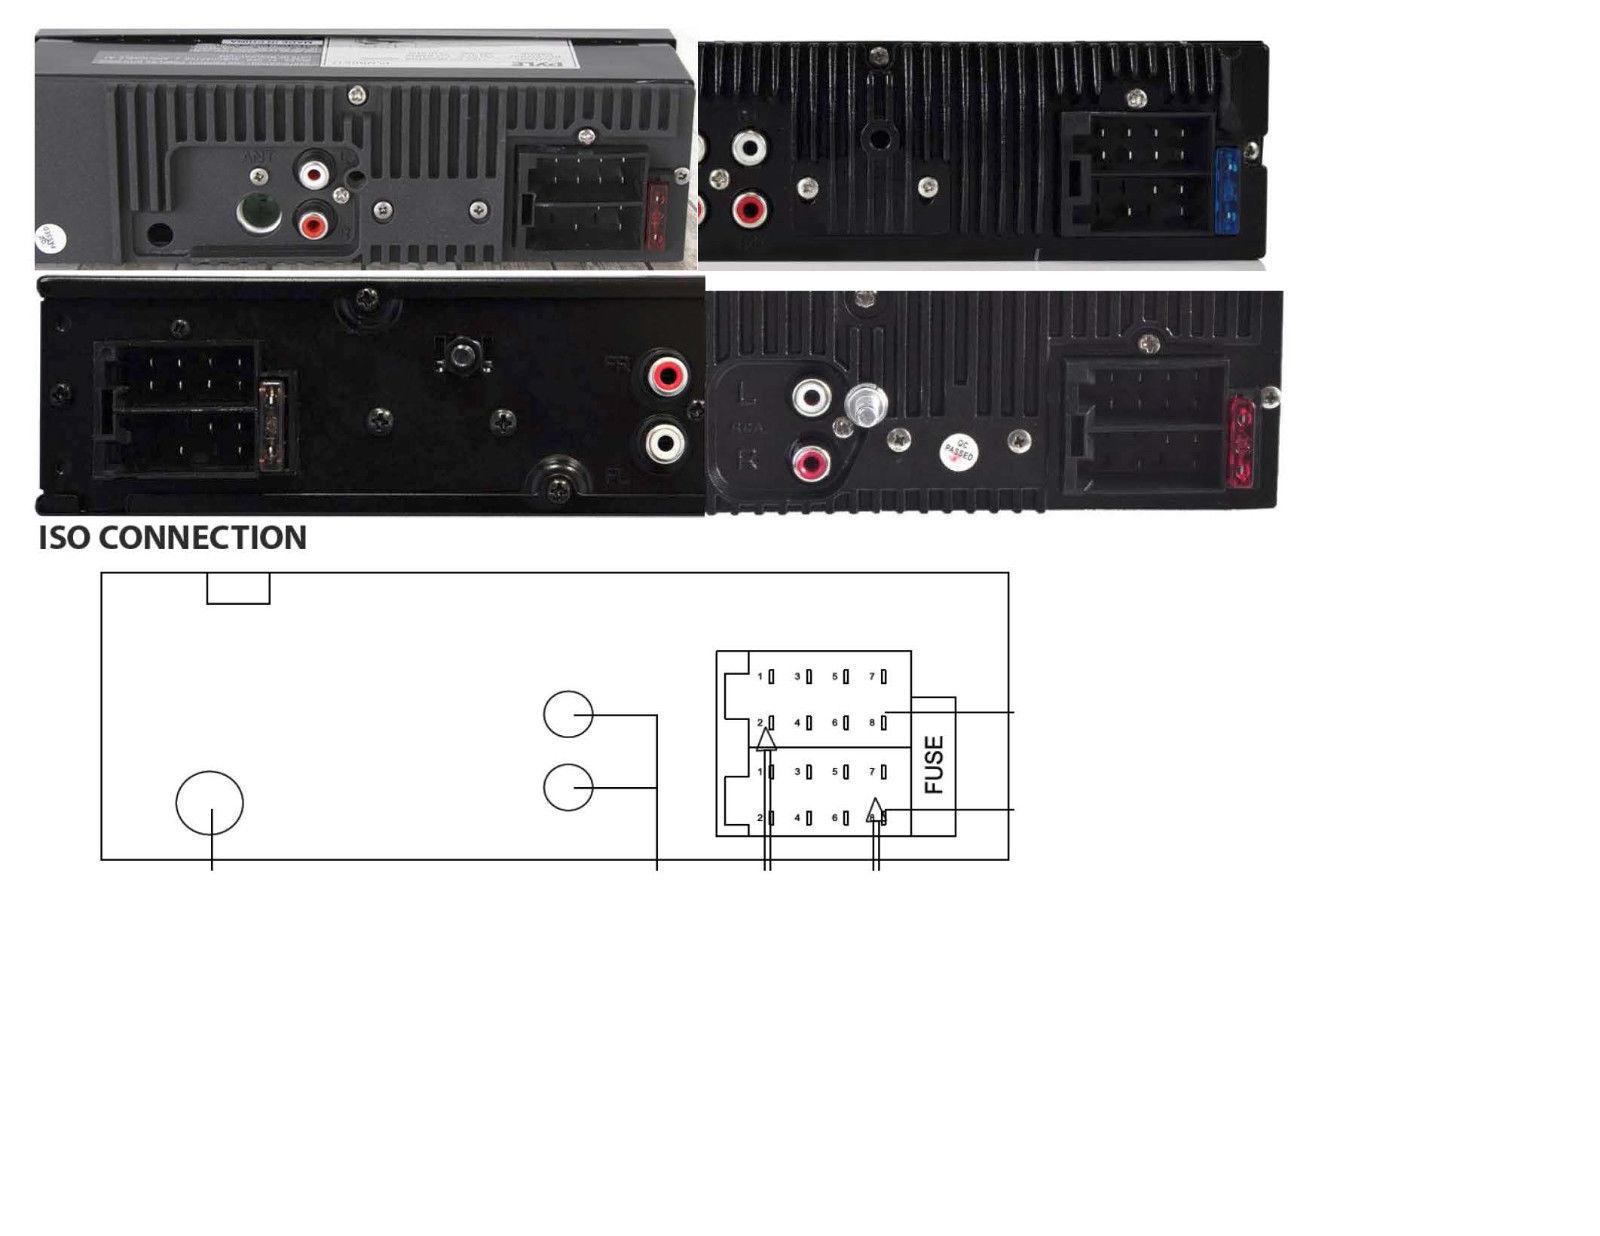 ... Xtenzi 16 Pin Radio Wire ISO Harness for Pyle Marine Boat PLMR21BT  PLMR20W new